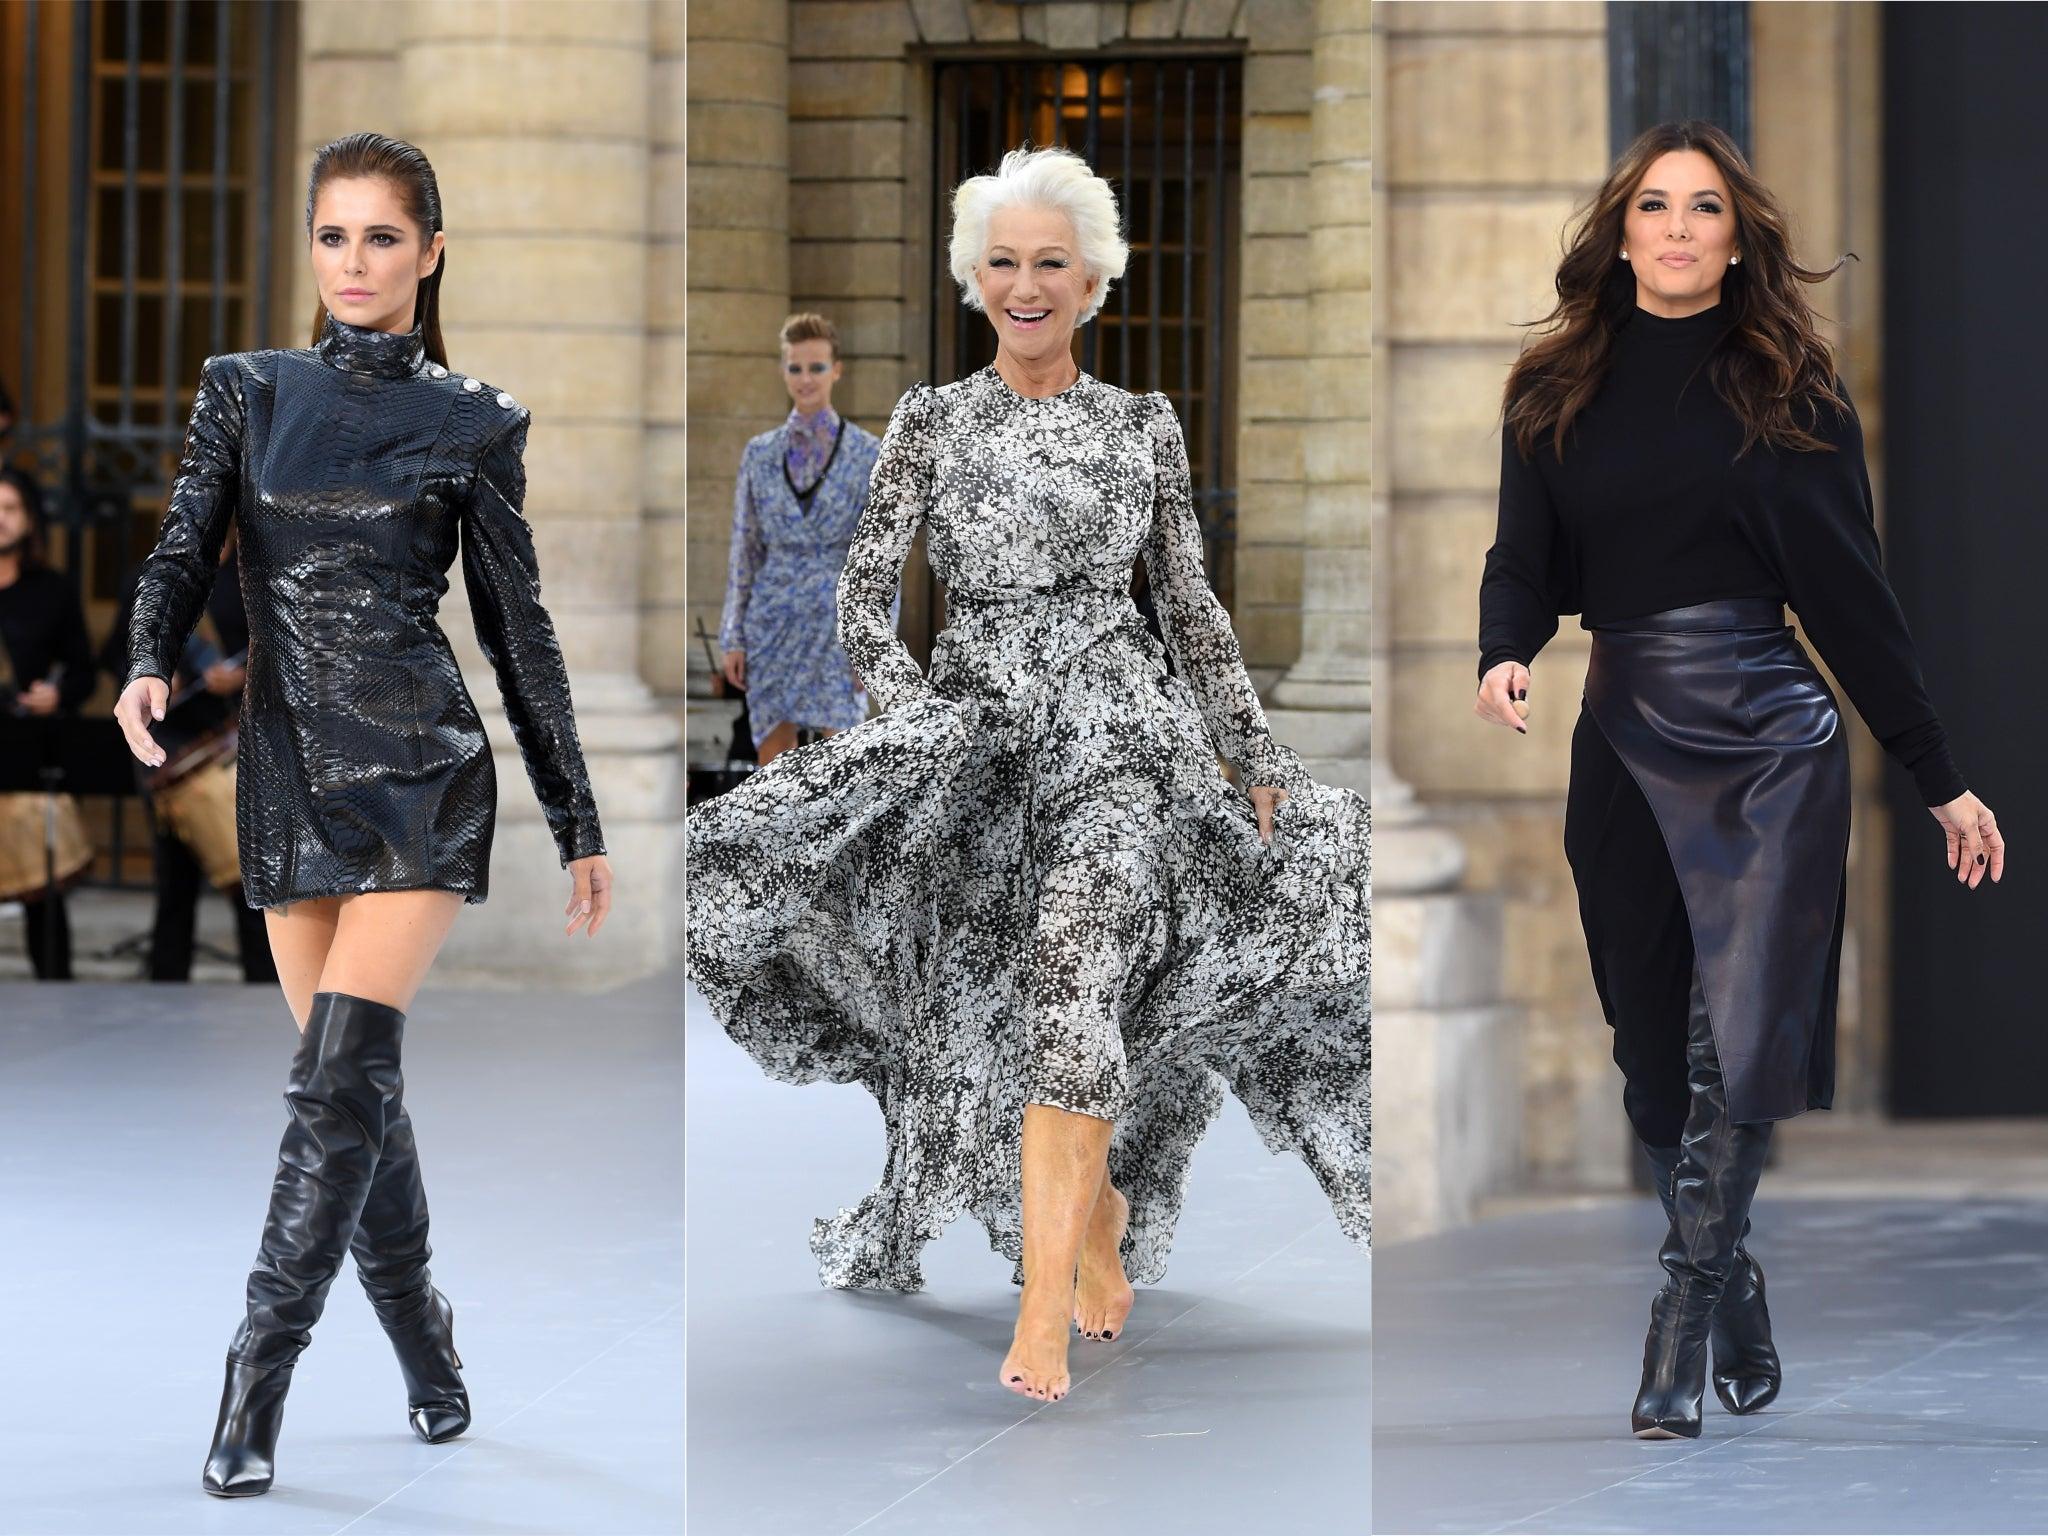 Paris Fashion Week: Helen Mirren, Eva Longoria and Cheryl Tweedy star in L'Oréal show